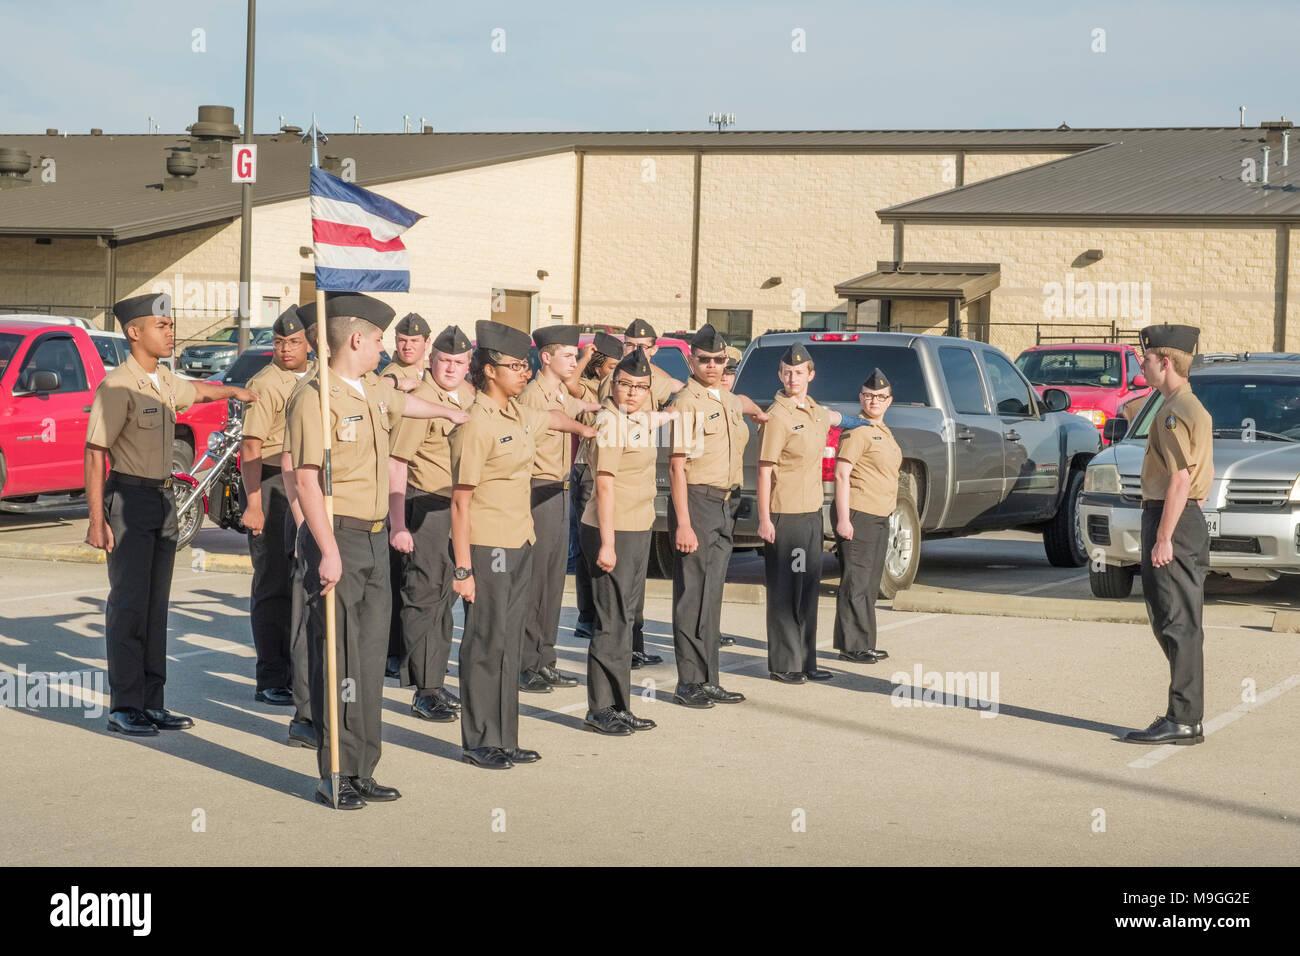 US Navy NJROTC high school Kadetten in der Formation vor marschieren Bohrer in Georgetown, Texas Stockbild